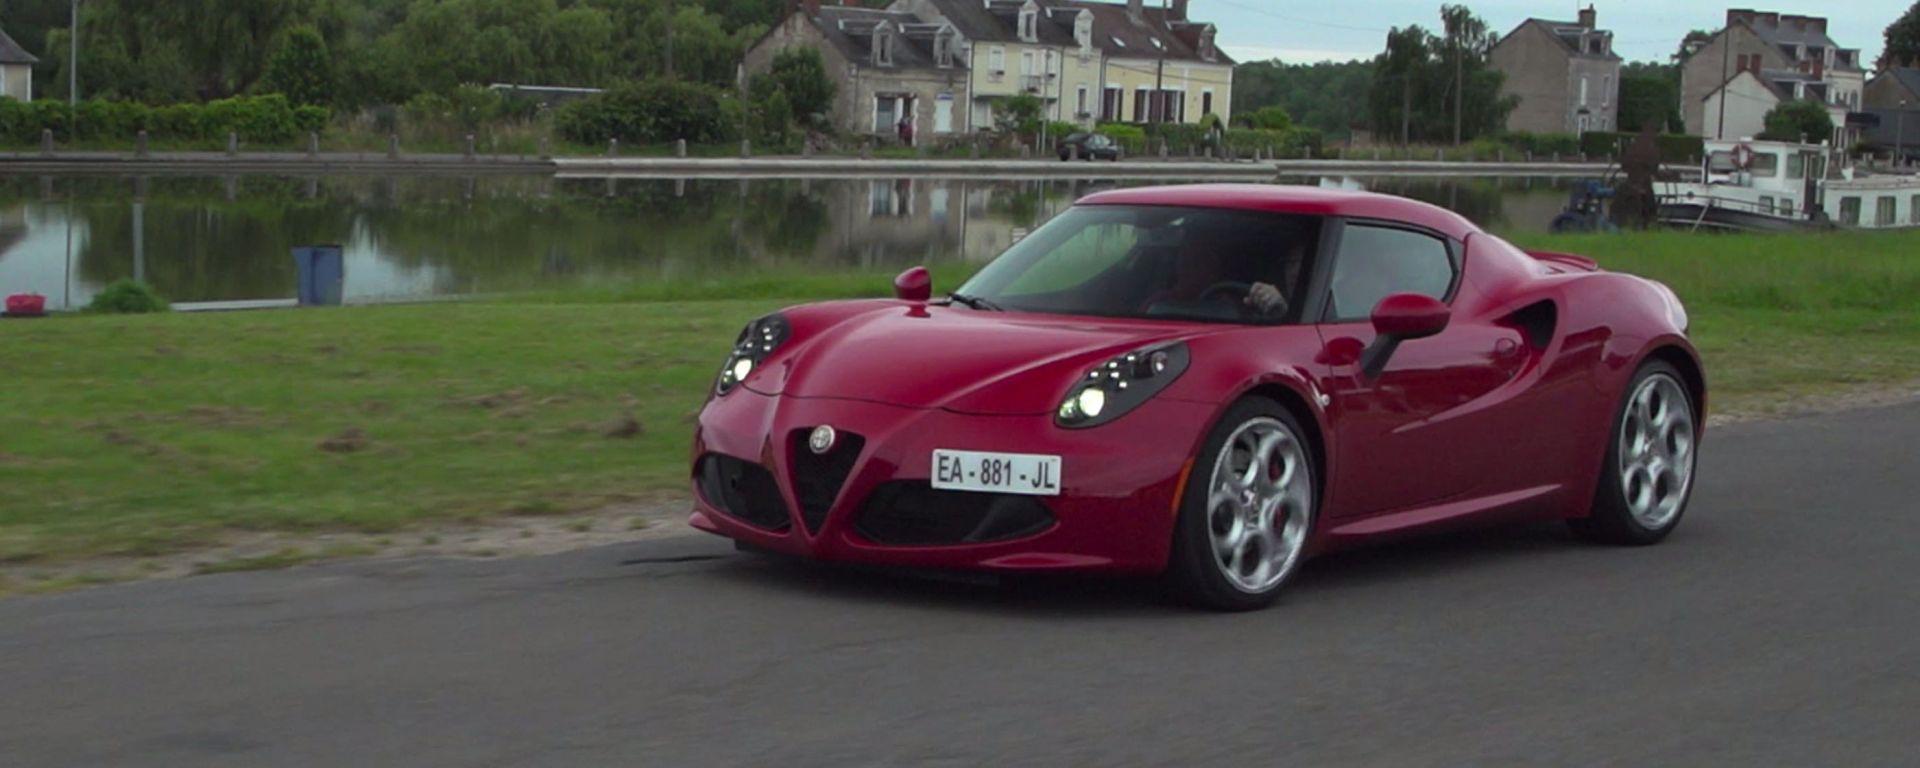 Alfa Romeo 4C: parlano i proprietari